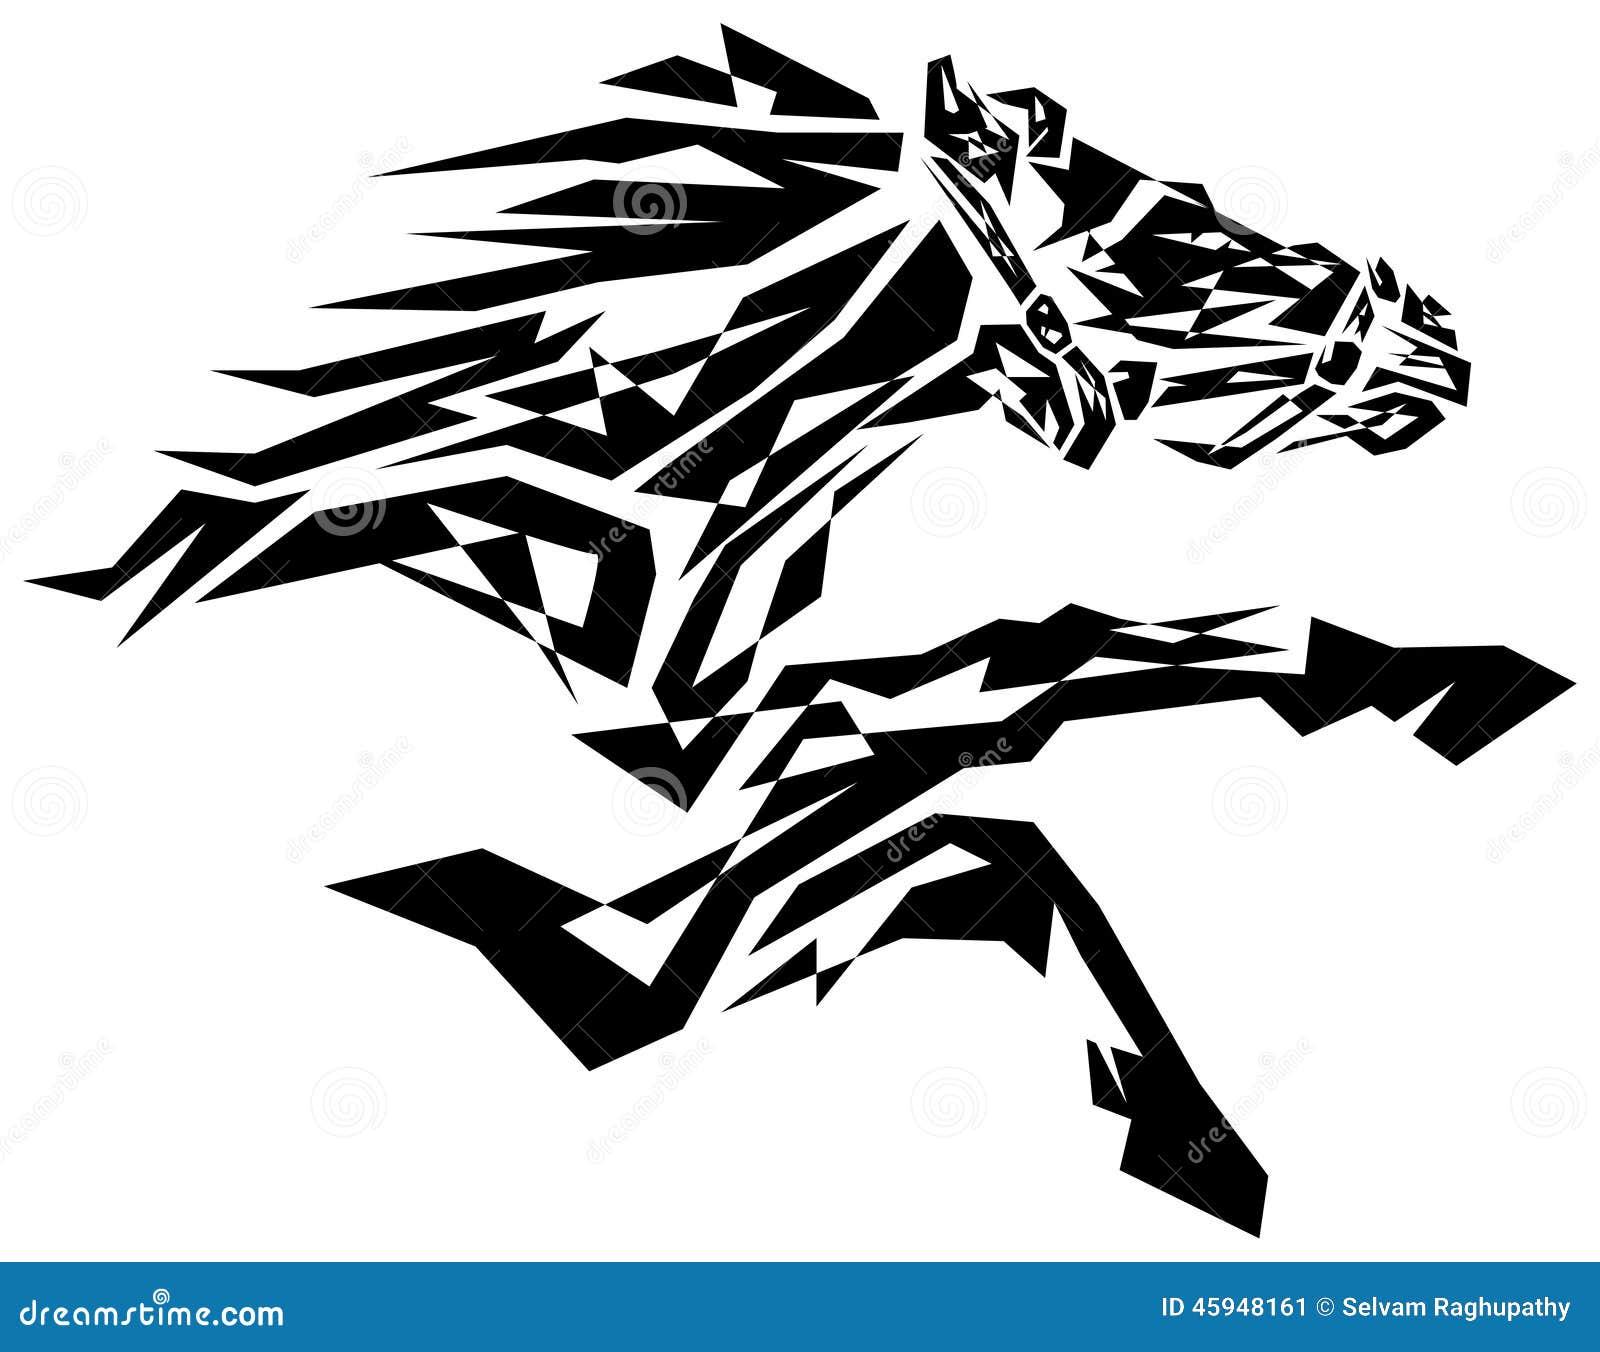 Black Horse Illustration 45948161 Megapixl